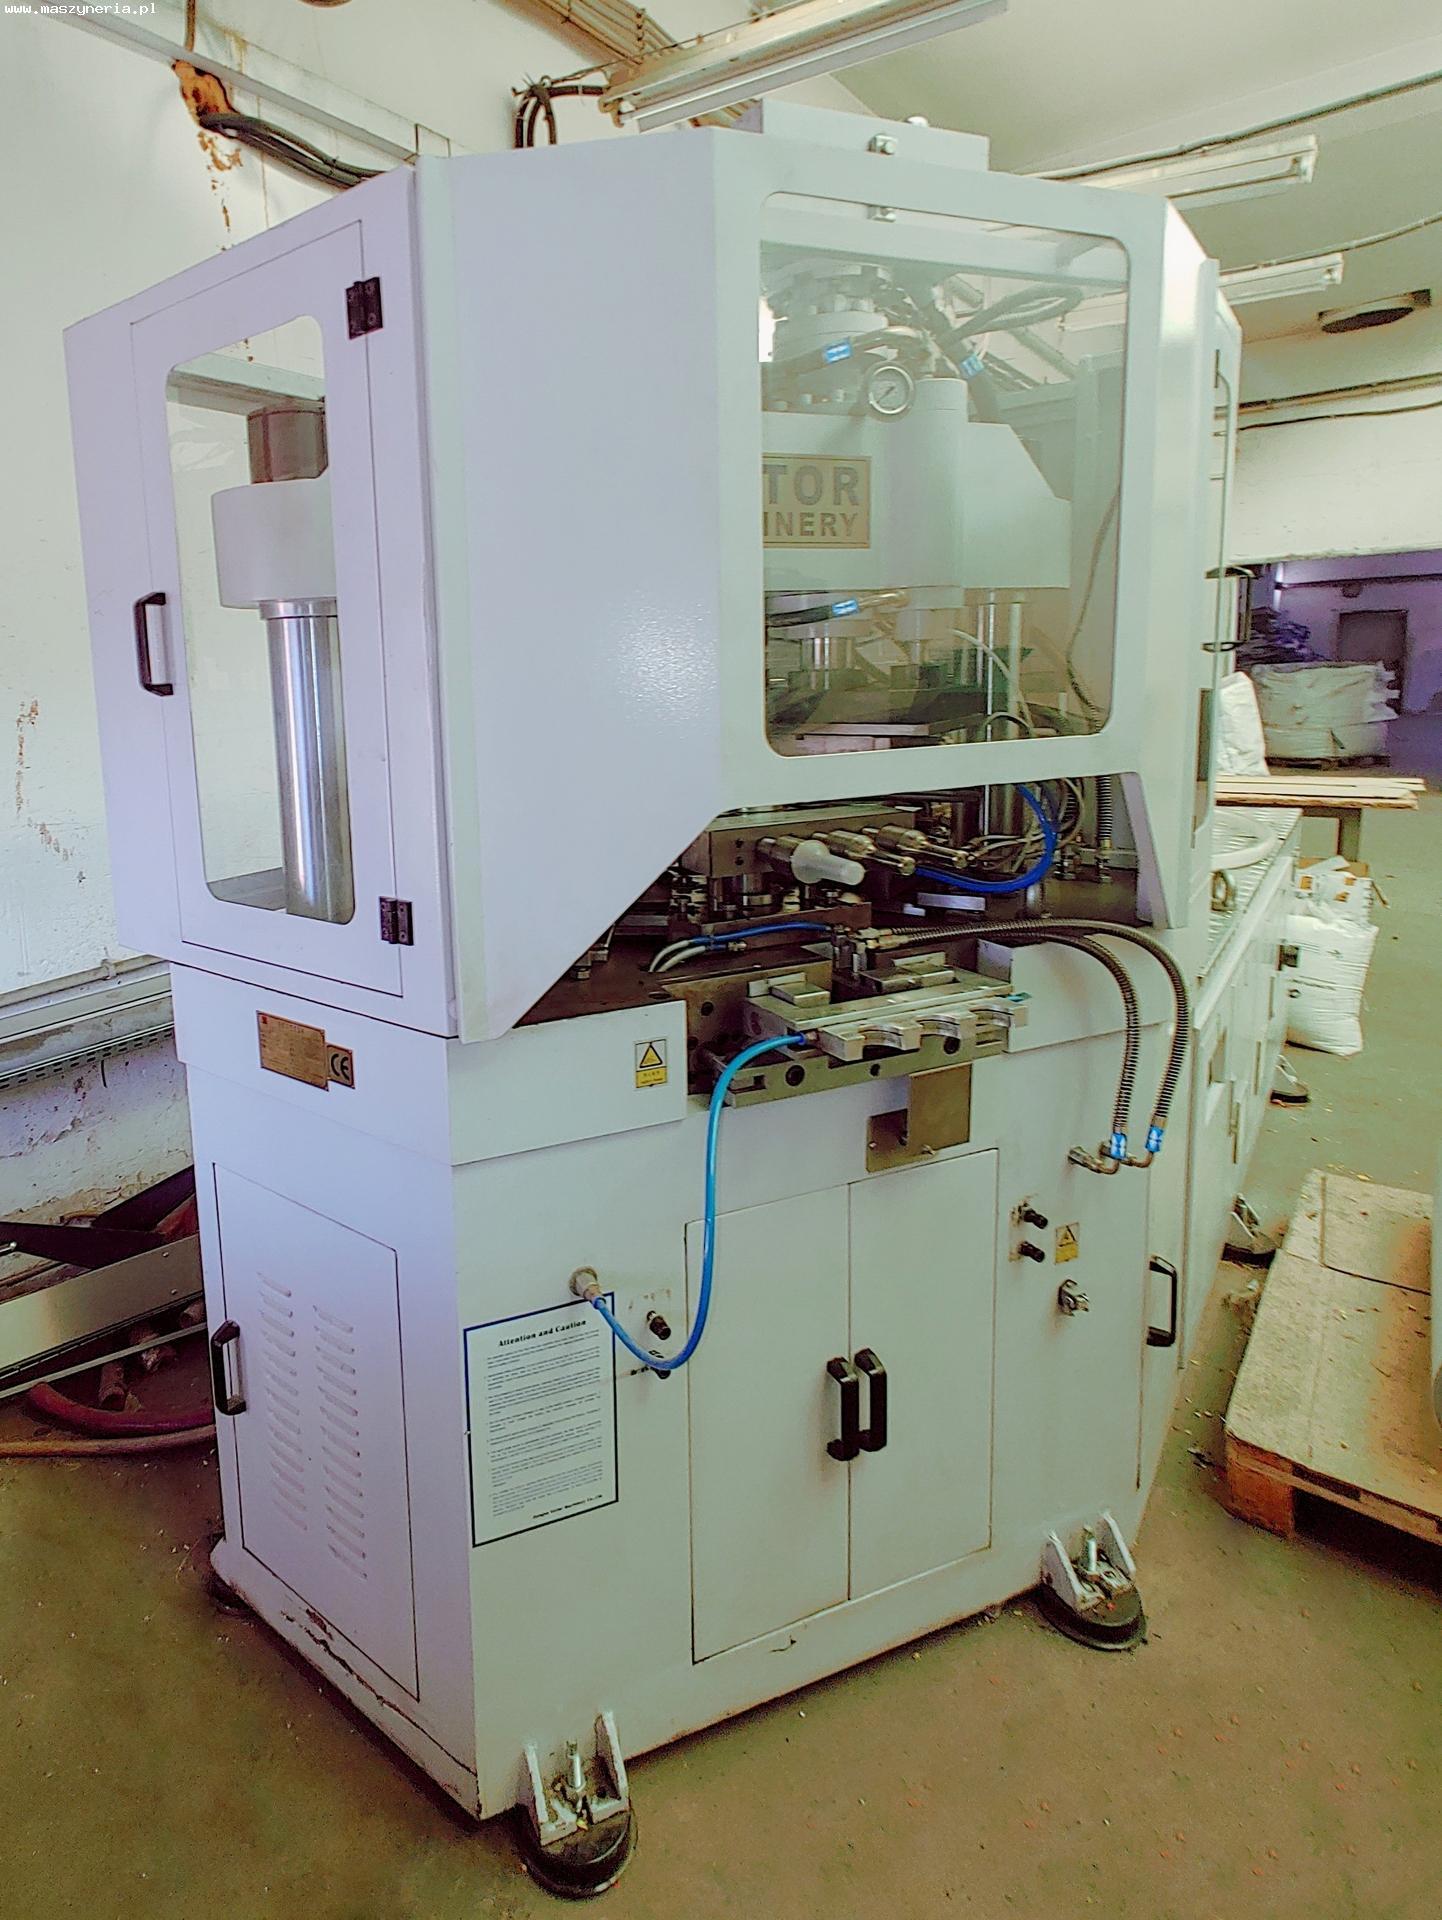 Soffiatrice ad iniezione VICTOR MACHINERY MSZ 30 in vendita - foto 4